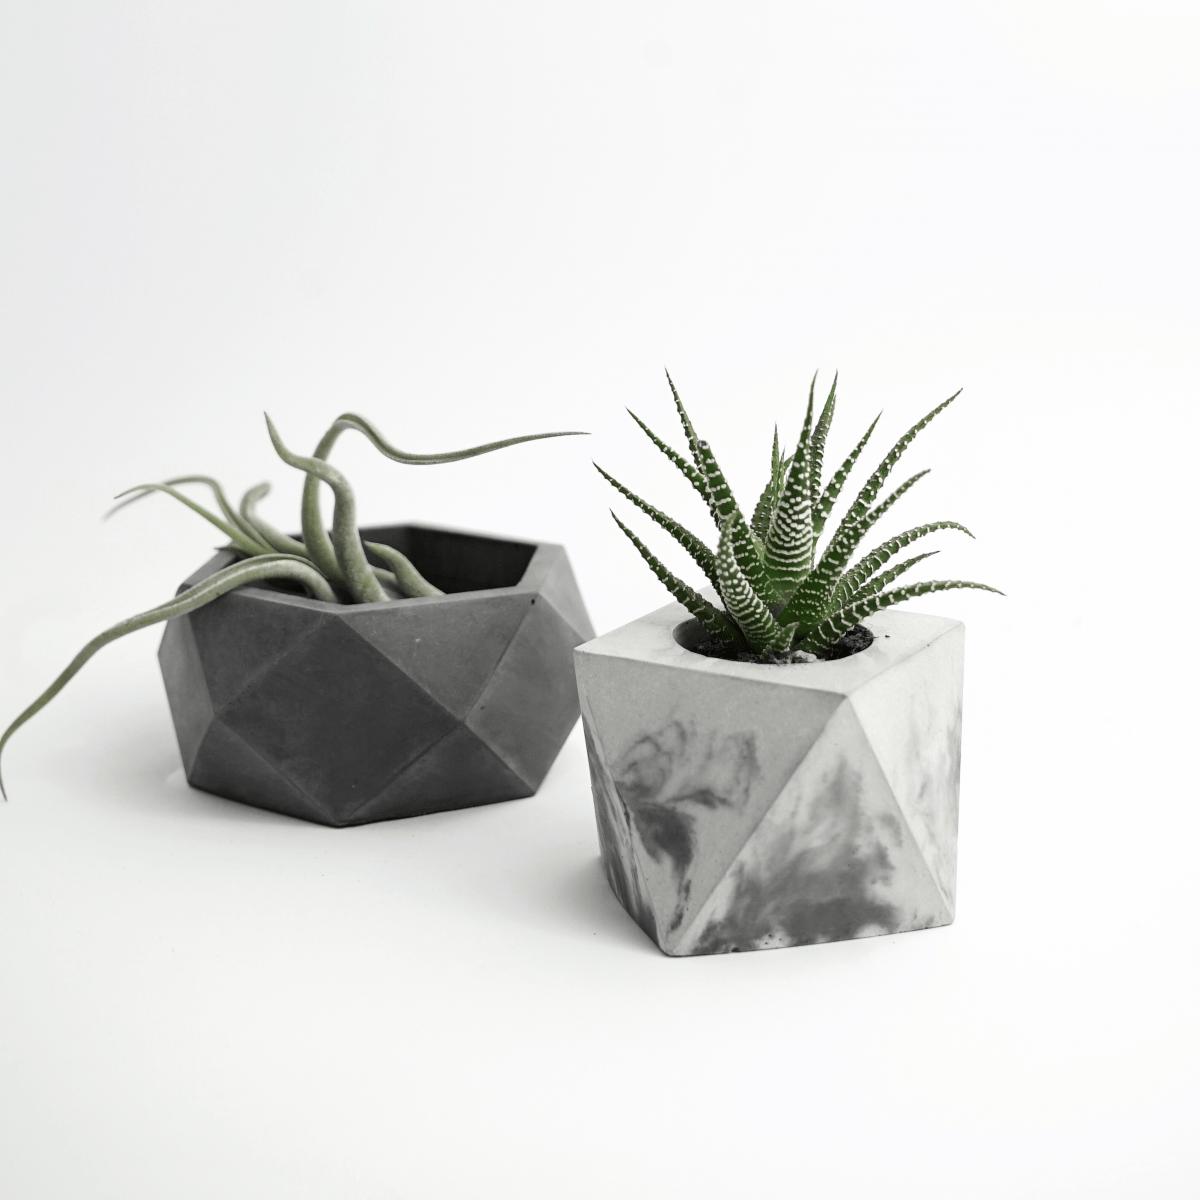 Vasi Moderni da interno  Vasi in cemento  FORMA MARBLE